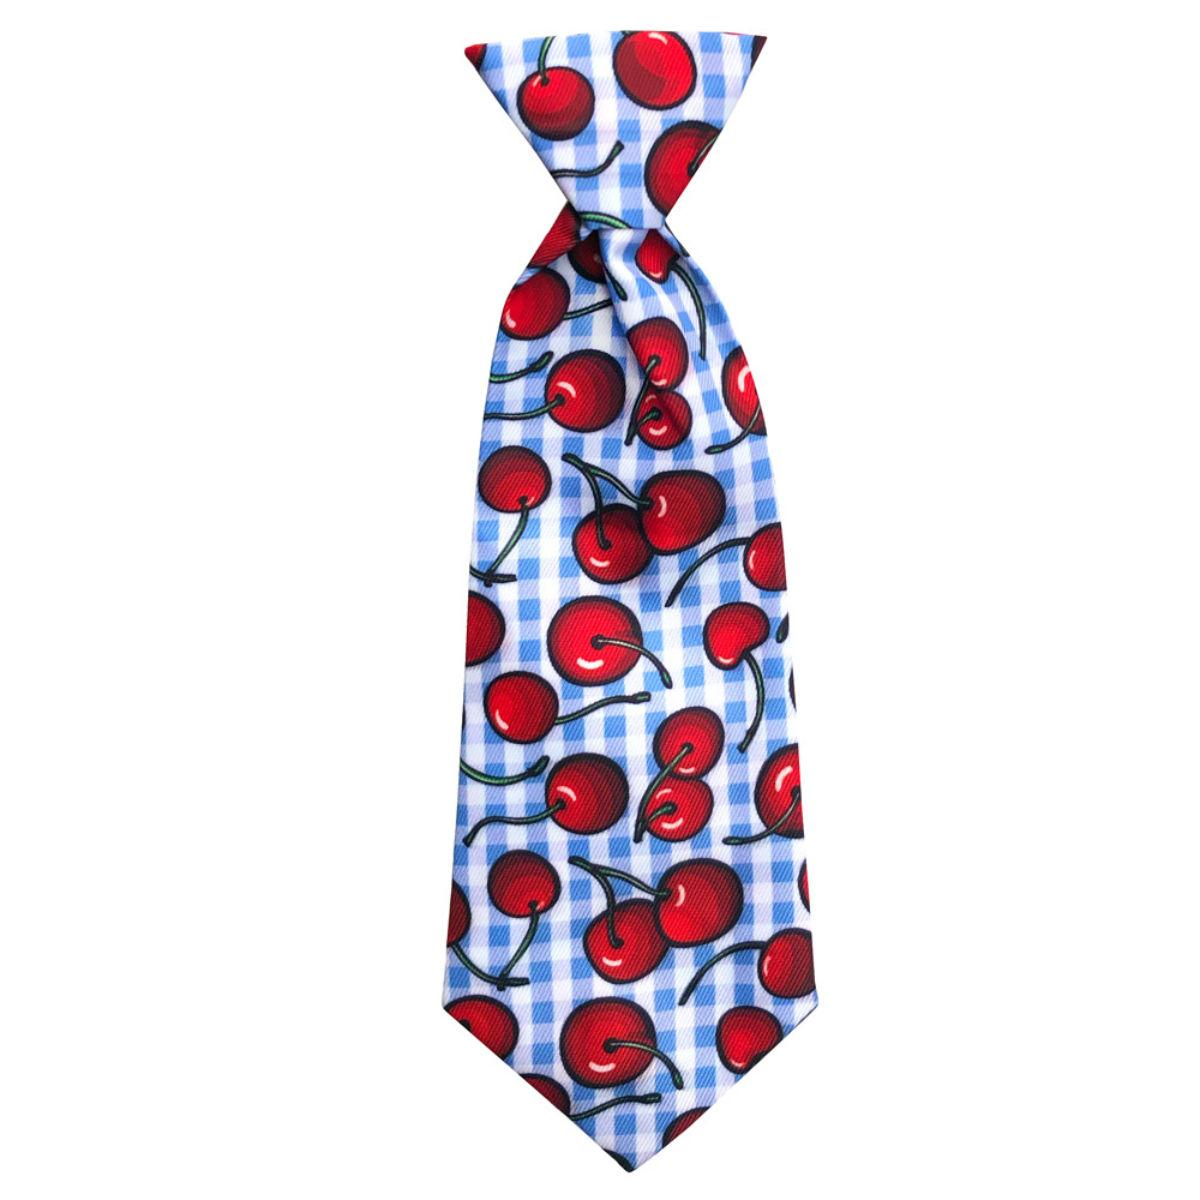 Huxley & Kent Long Tie Collar Attachment Dog Necktie - Americana Pie